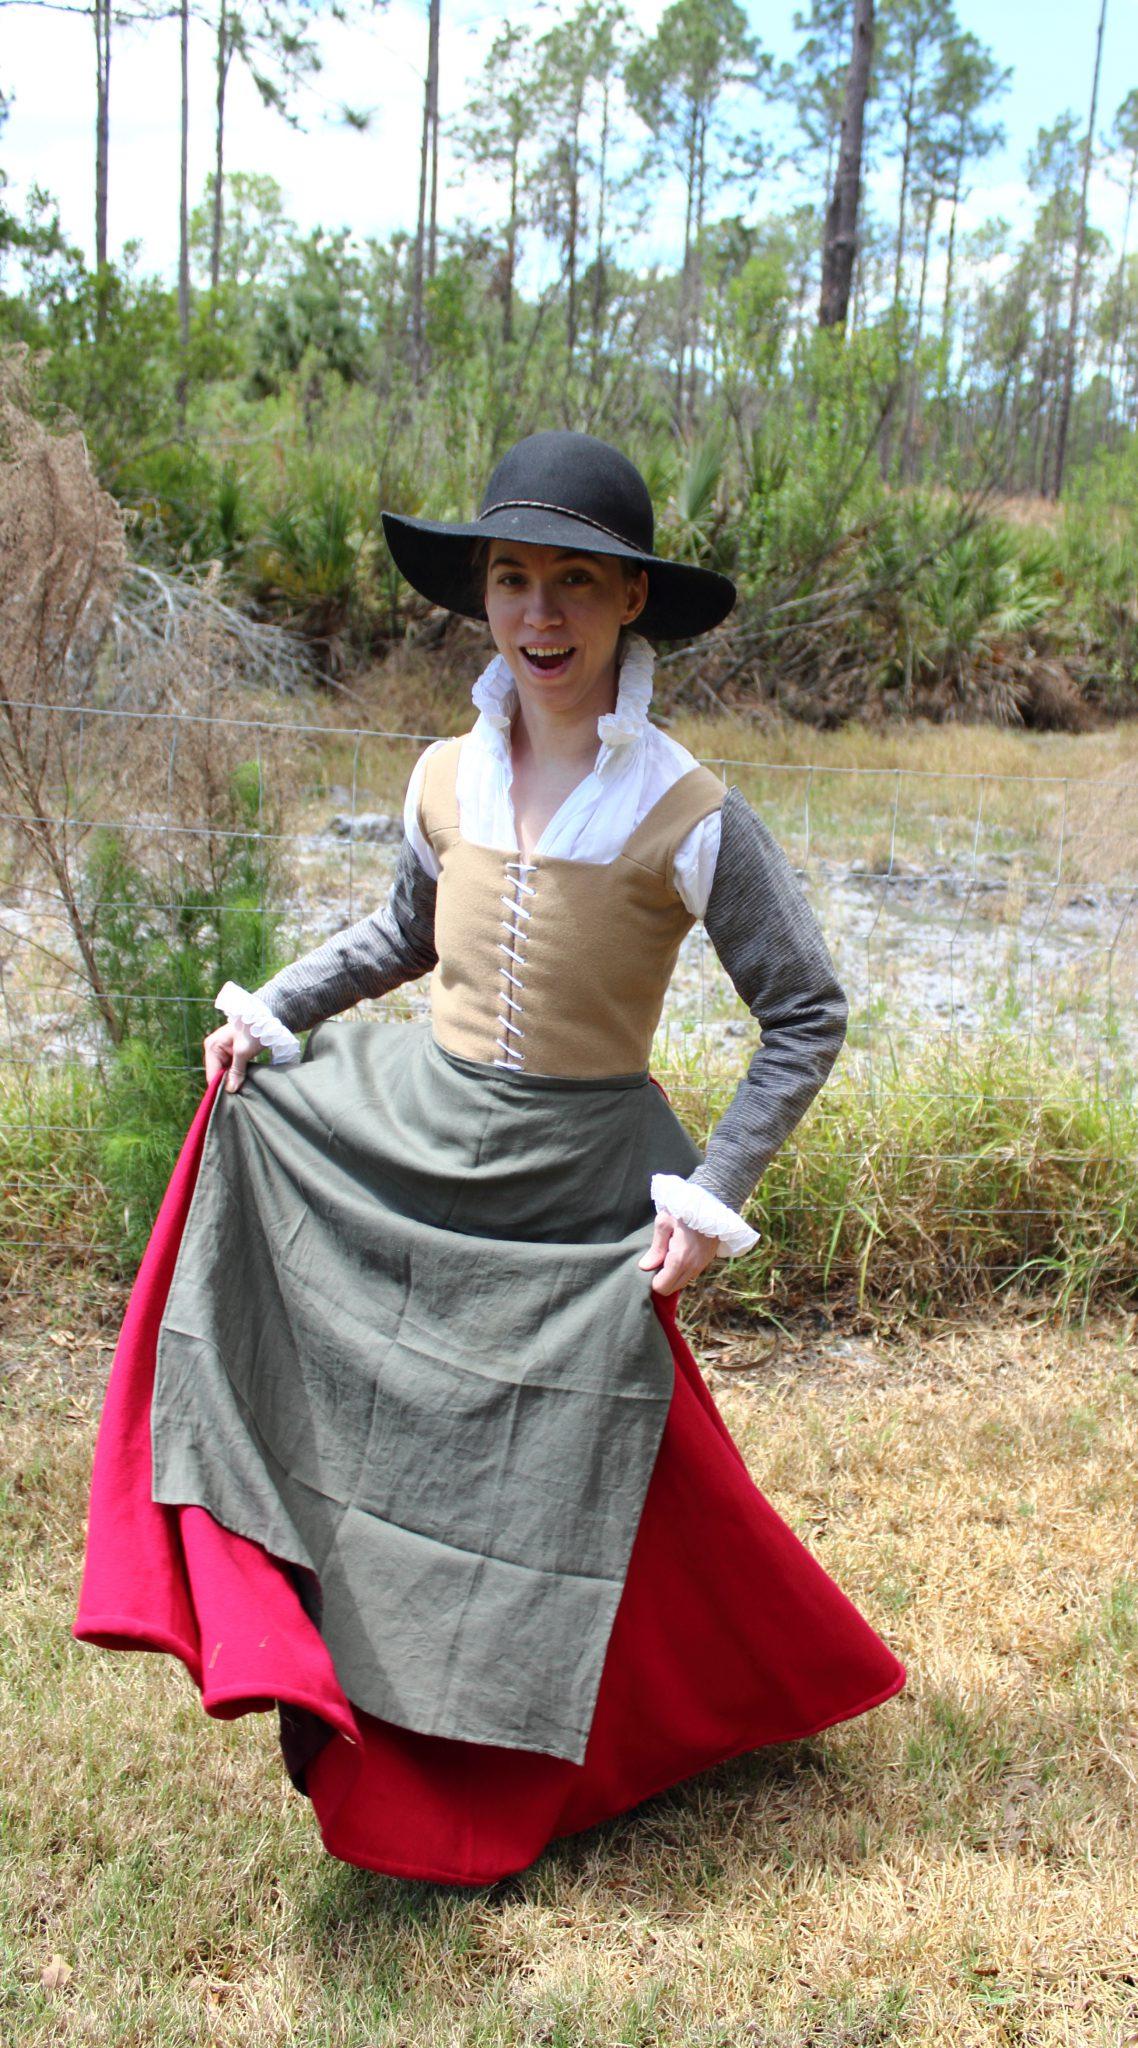 Caramel Wool Petticoat Bodies and Scarlet Wool Skirt